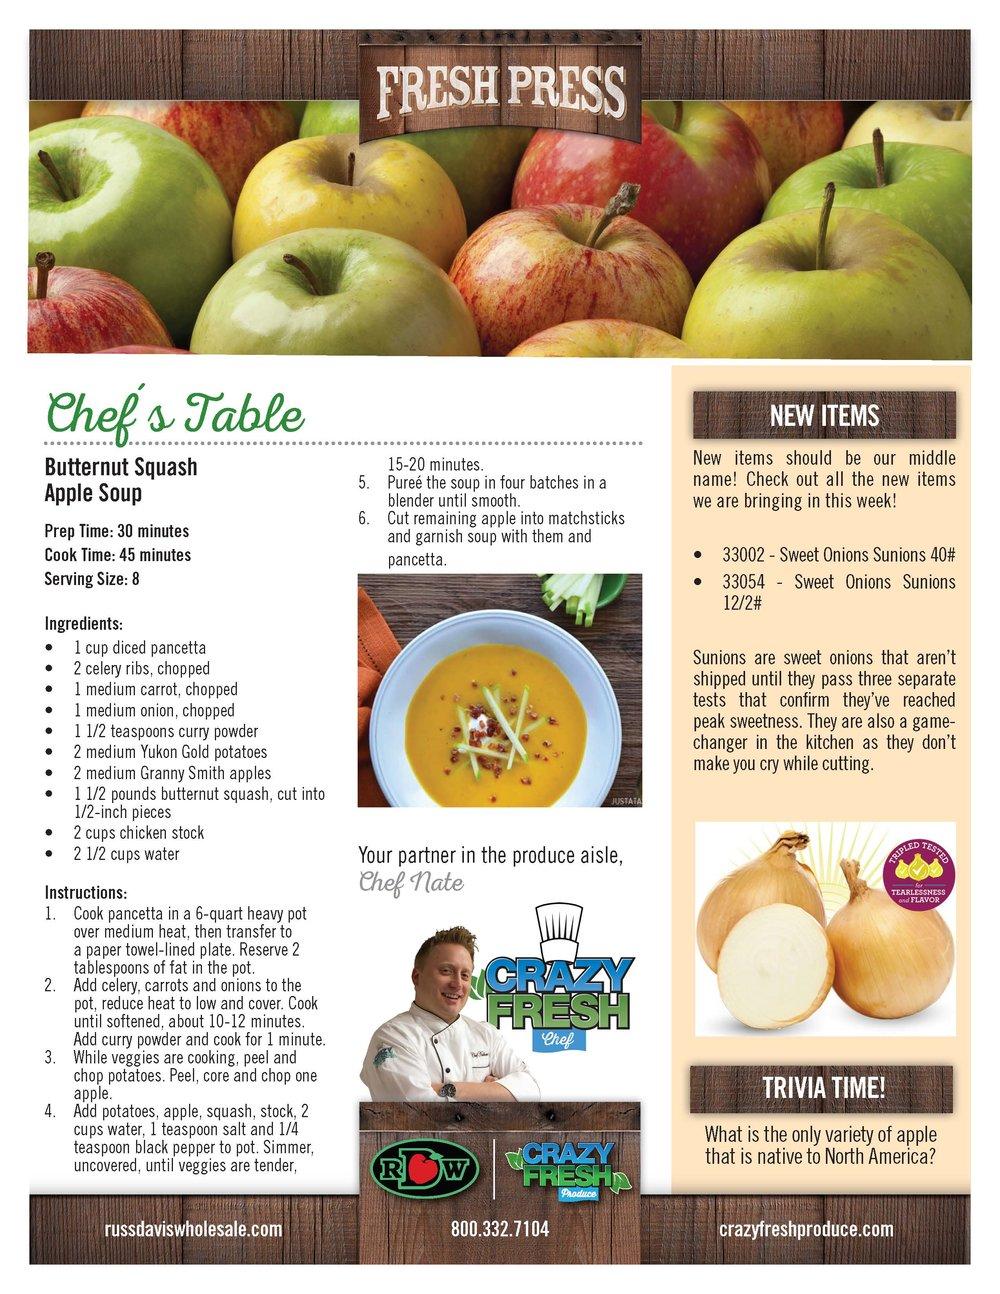 RDW_Fresh_Press_Jan9_2019_Page_2.jpg